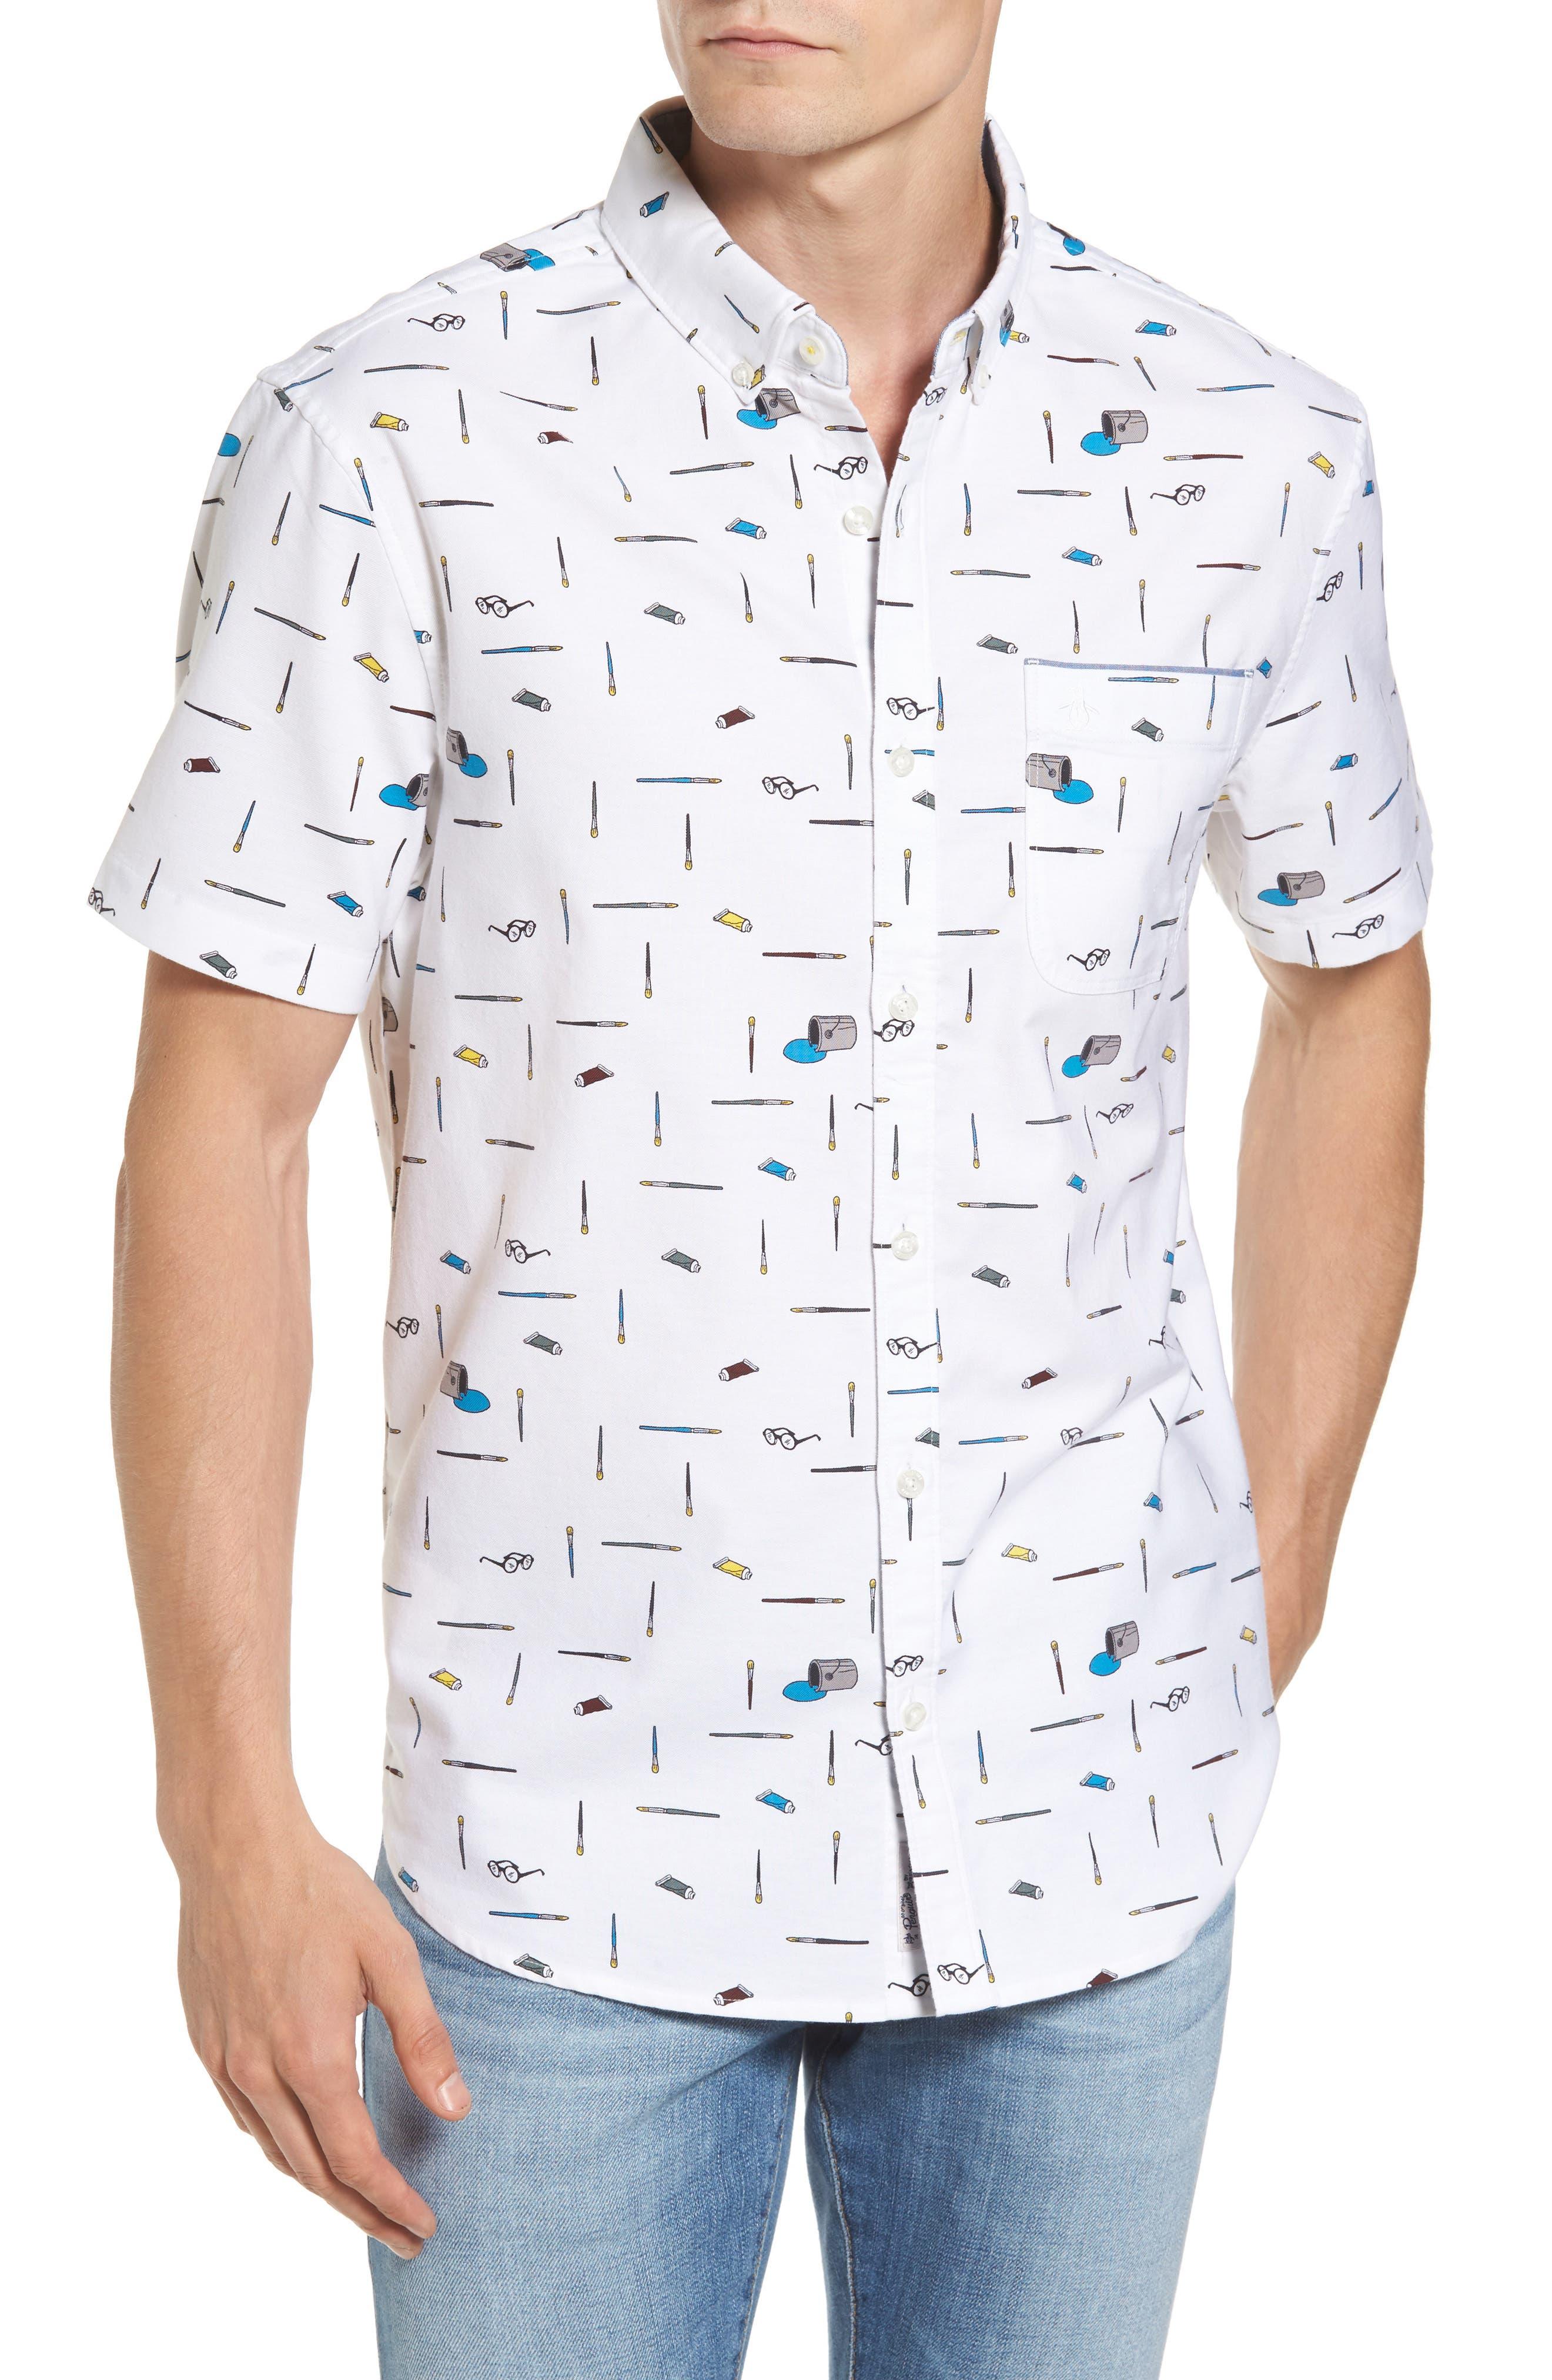 Alternate Image 1 Selected - Original Penguin Paintbrush Pattern Woven Shirt